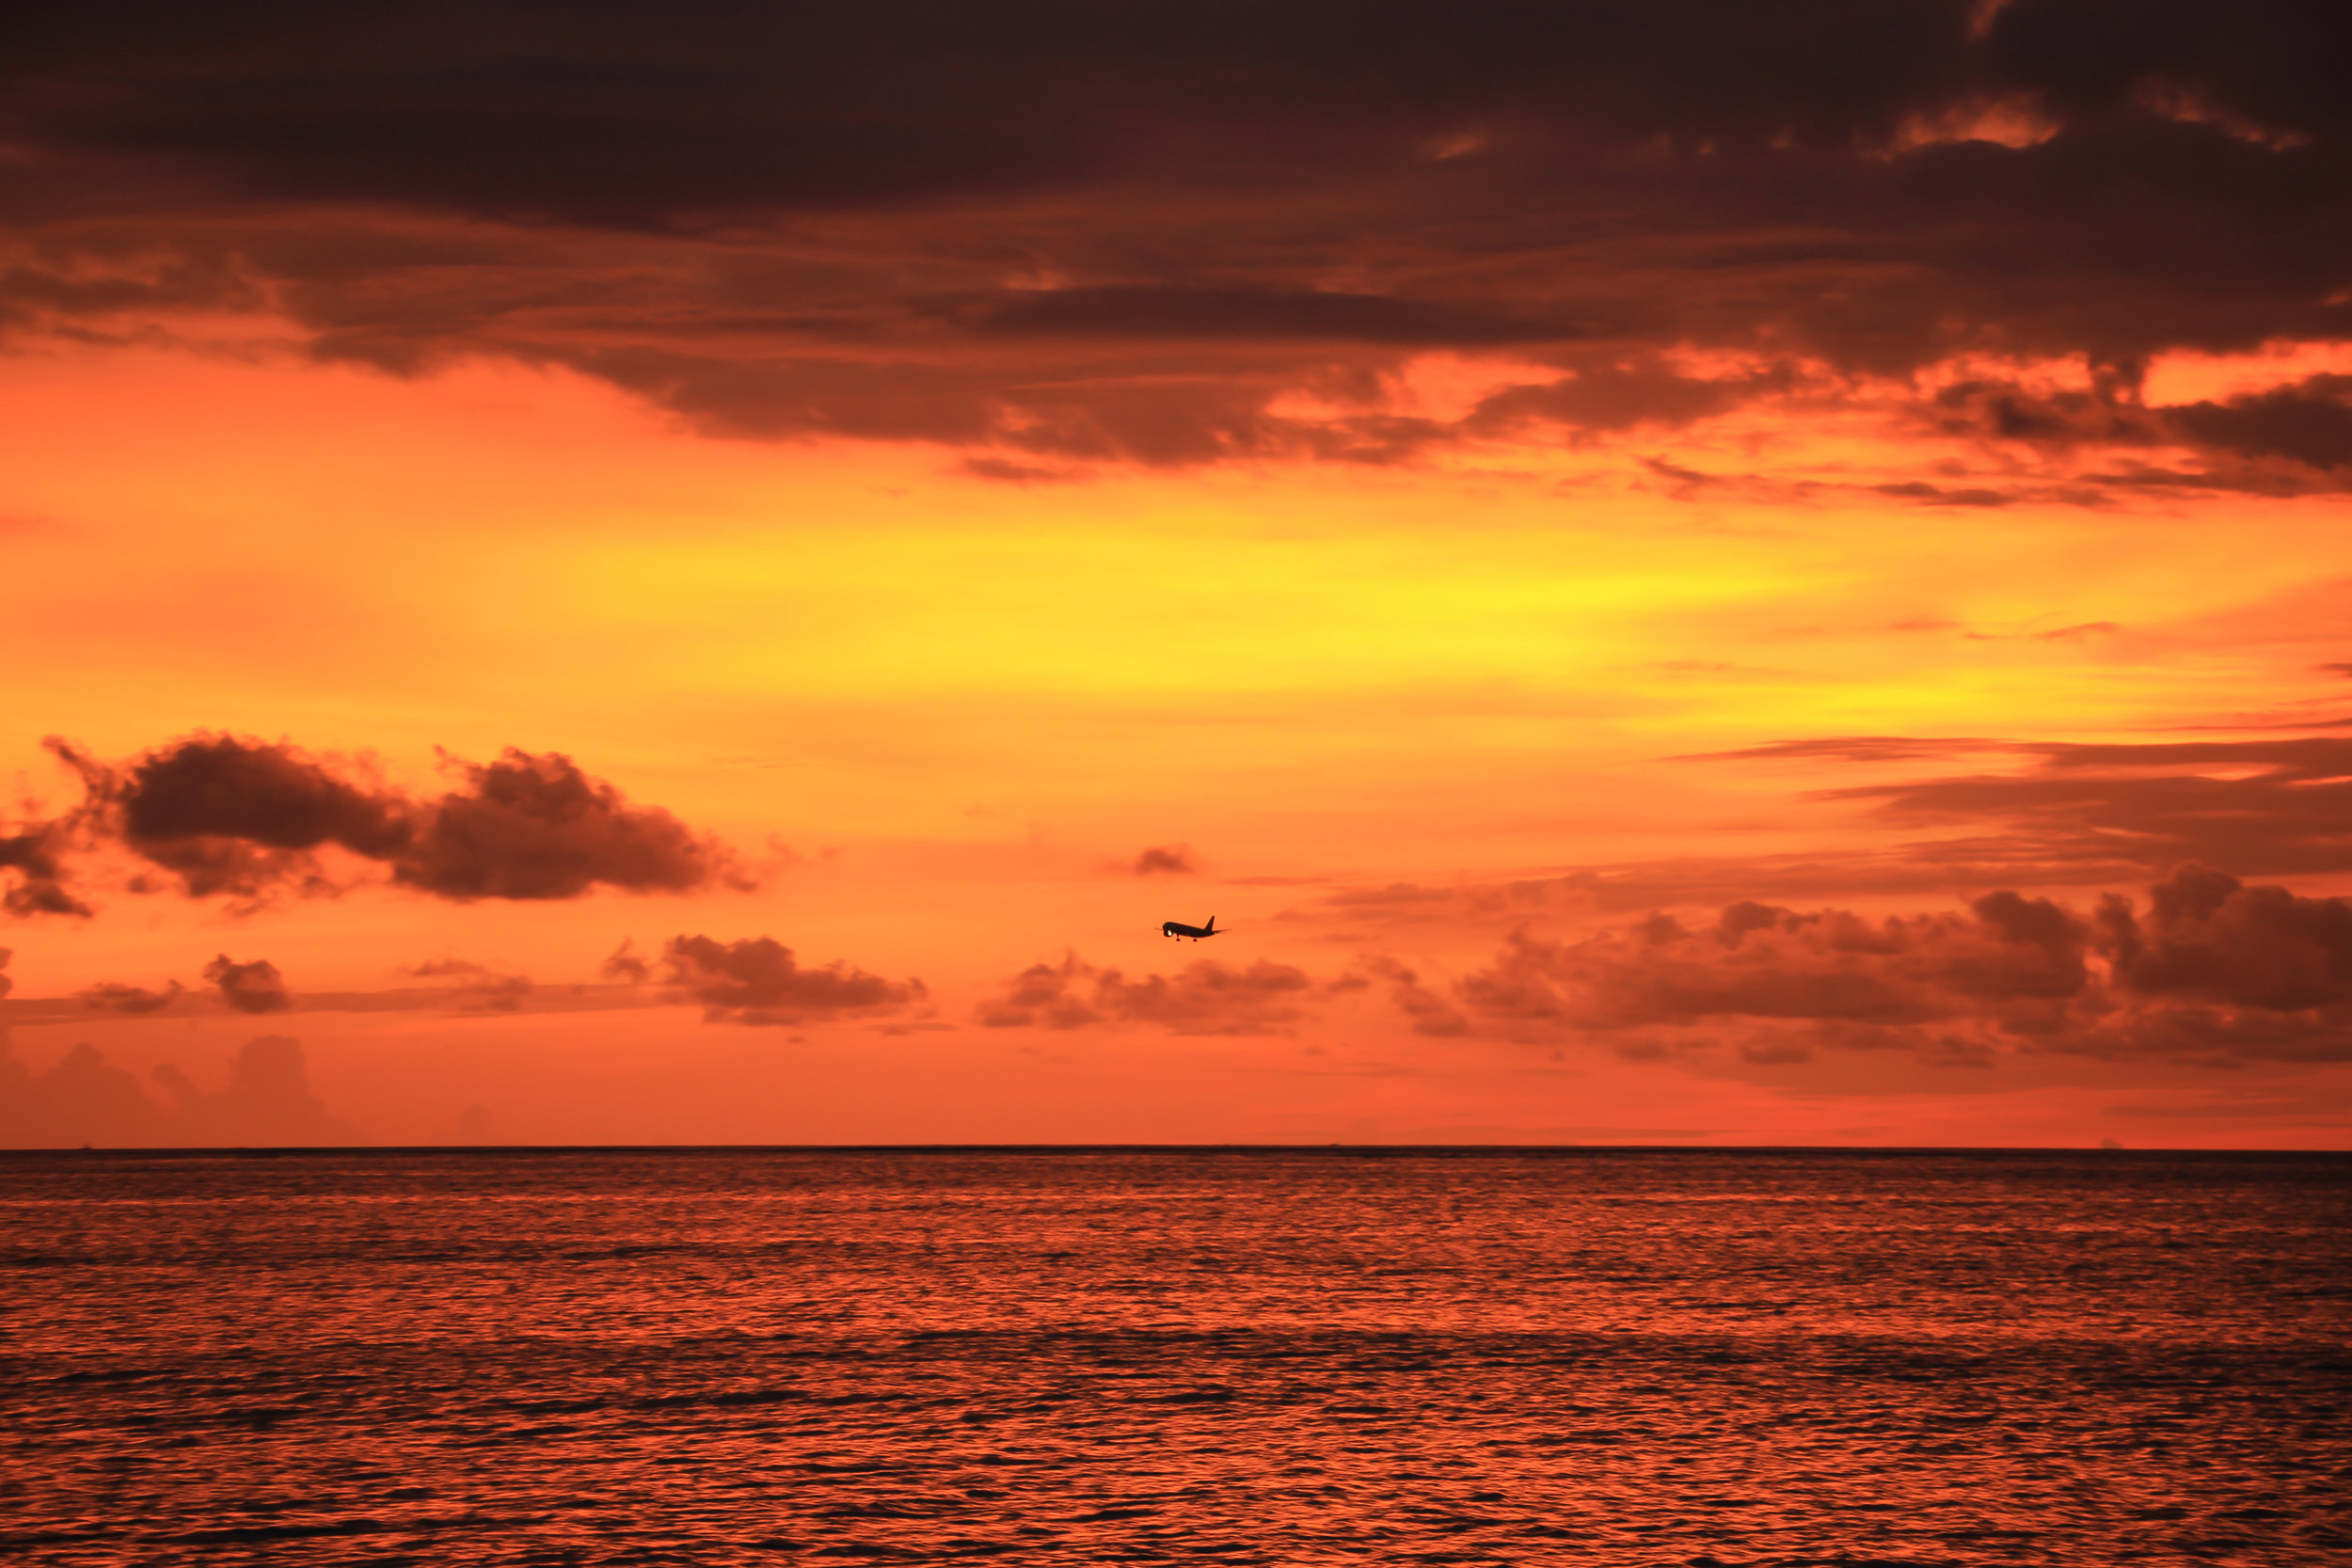 sunset, sky, clouds, sea, airplane, Bali, Indonesia, Asia | DoLessGetMoreDone.com |